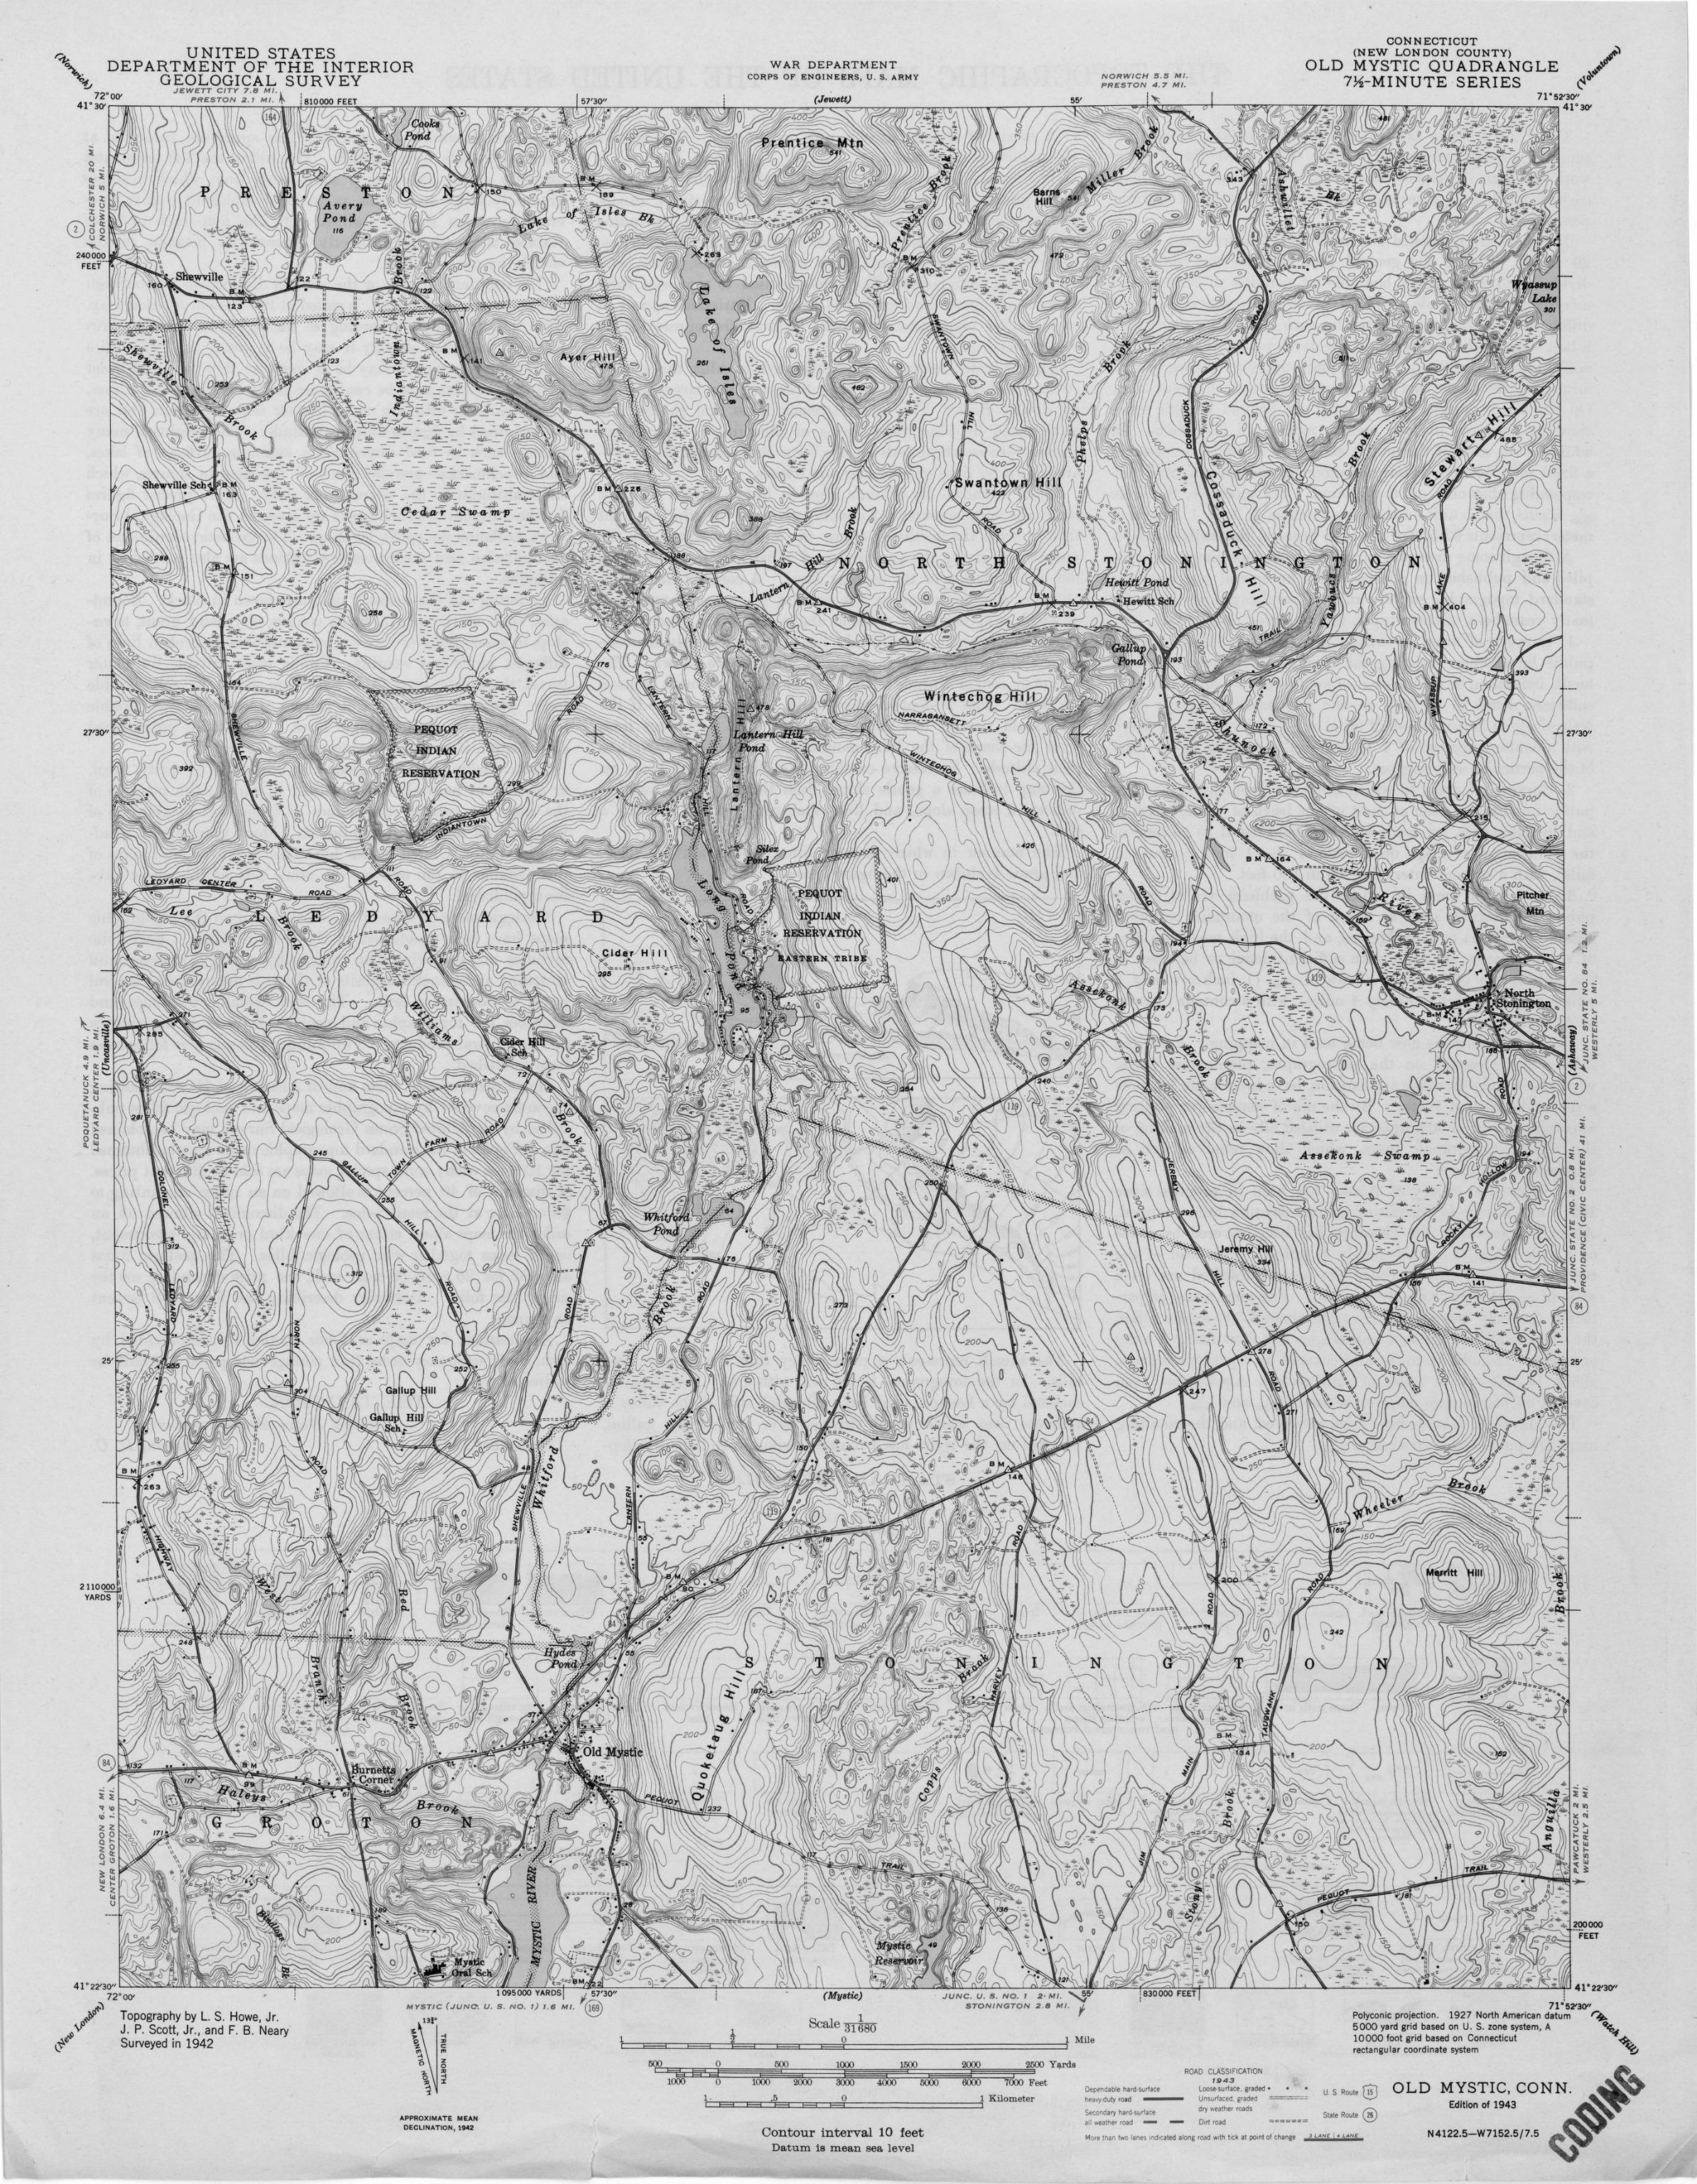 txu-pclmaps-topo-ct-old_mystic-1942.jpg